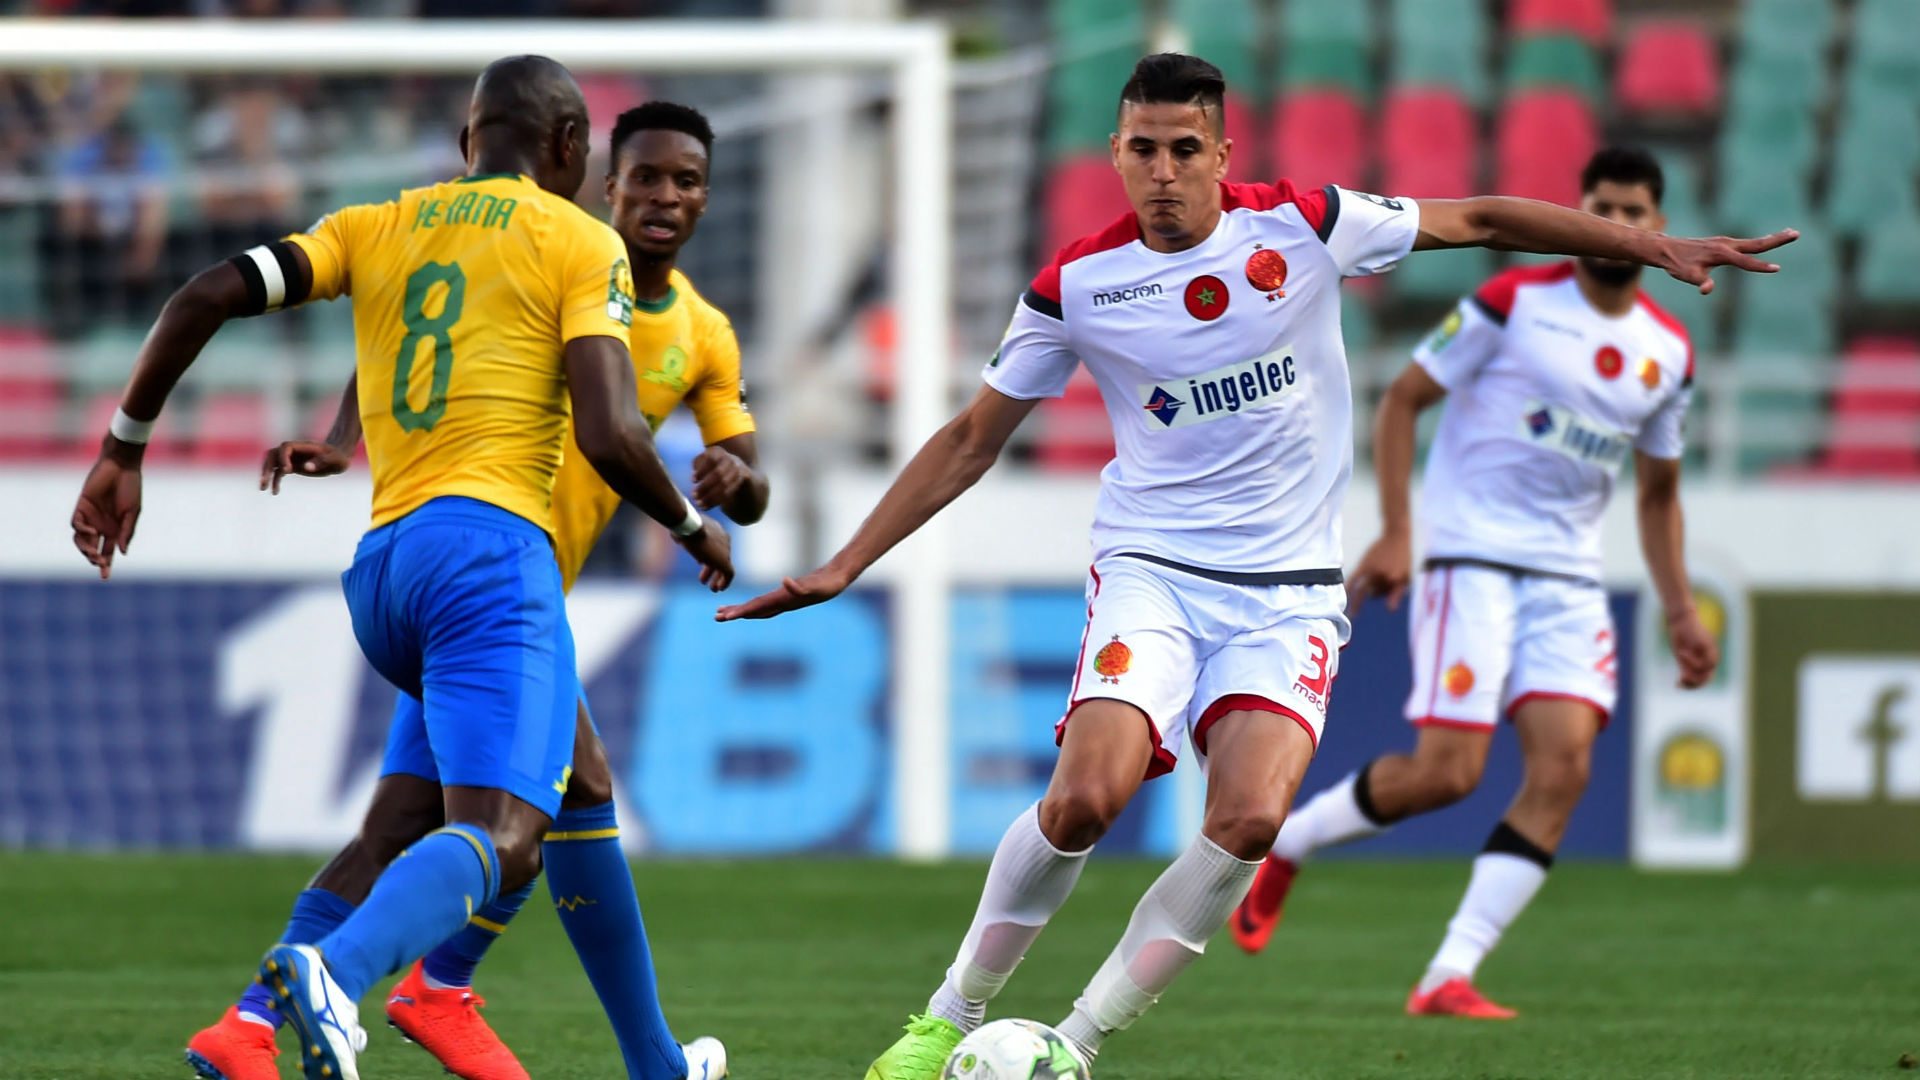 Ligue des Champions de la CAF: le Wac affrontera samedi Mamelodi Sundowns au stade Mohammed V